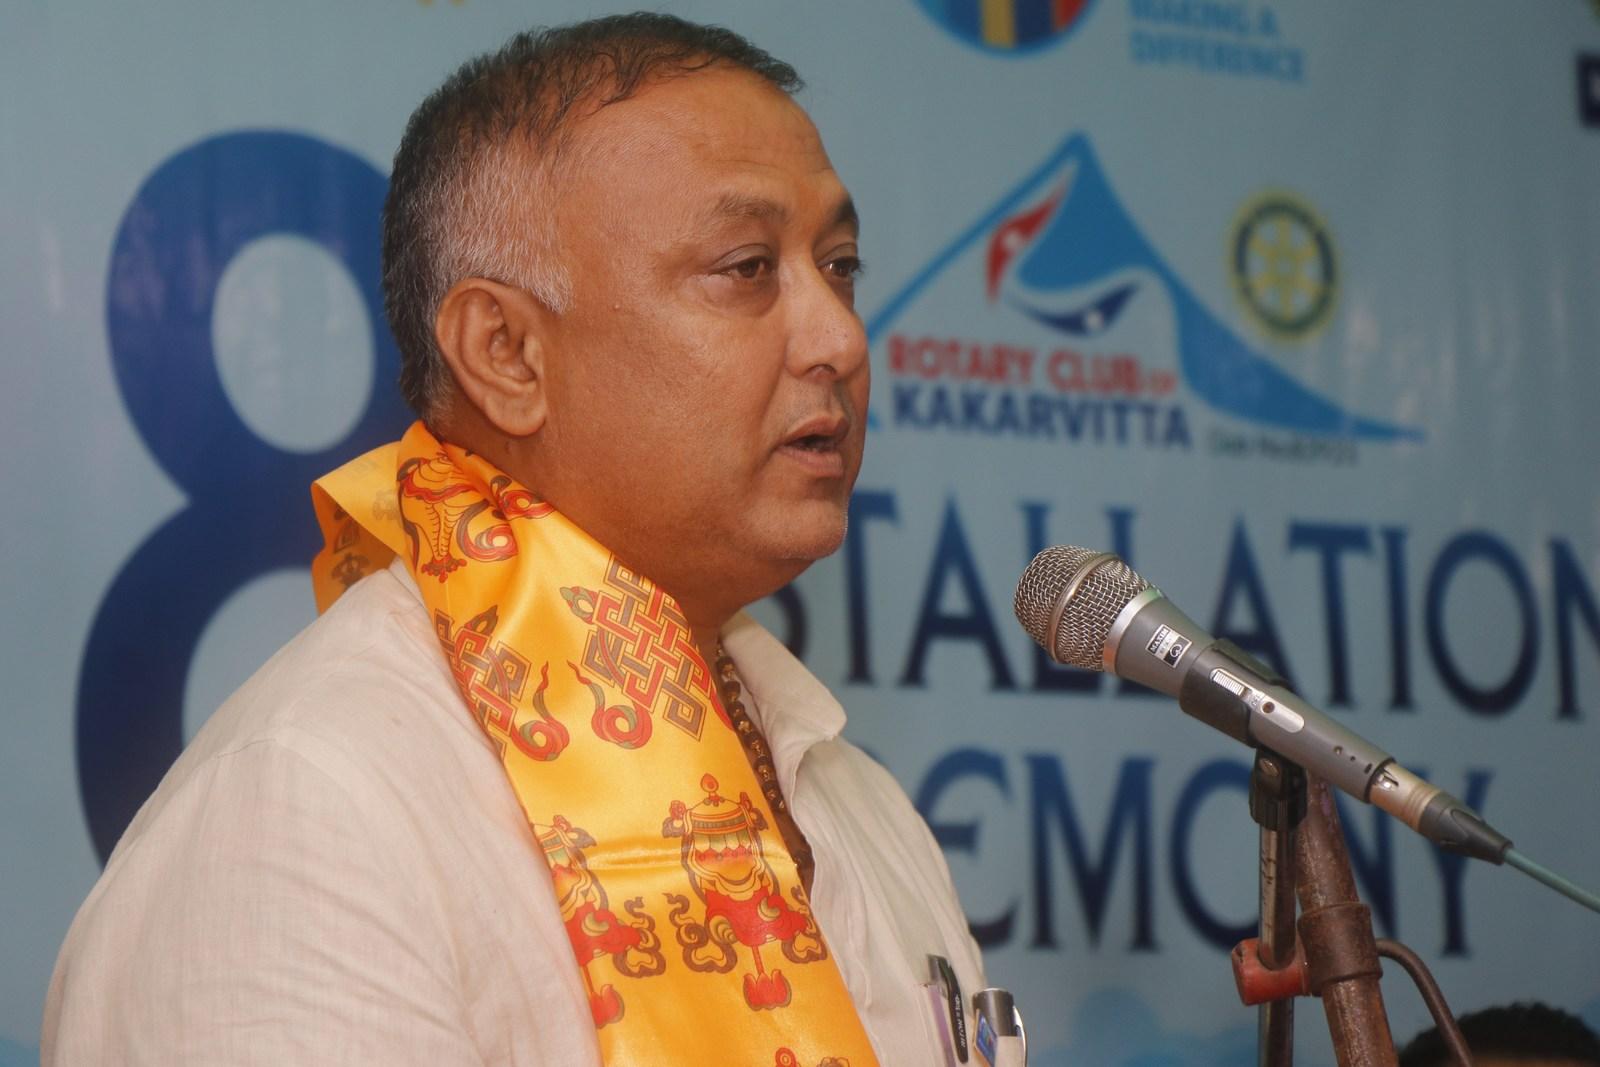 8th-Installation-Ceremony-Rotary-Club-of-Kakarvitta-98